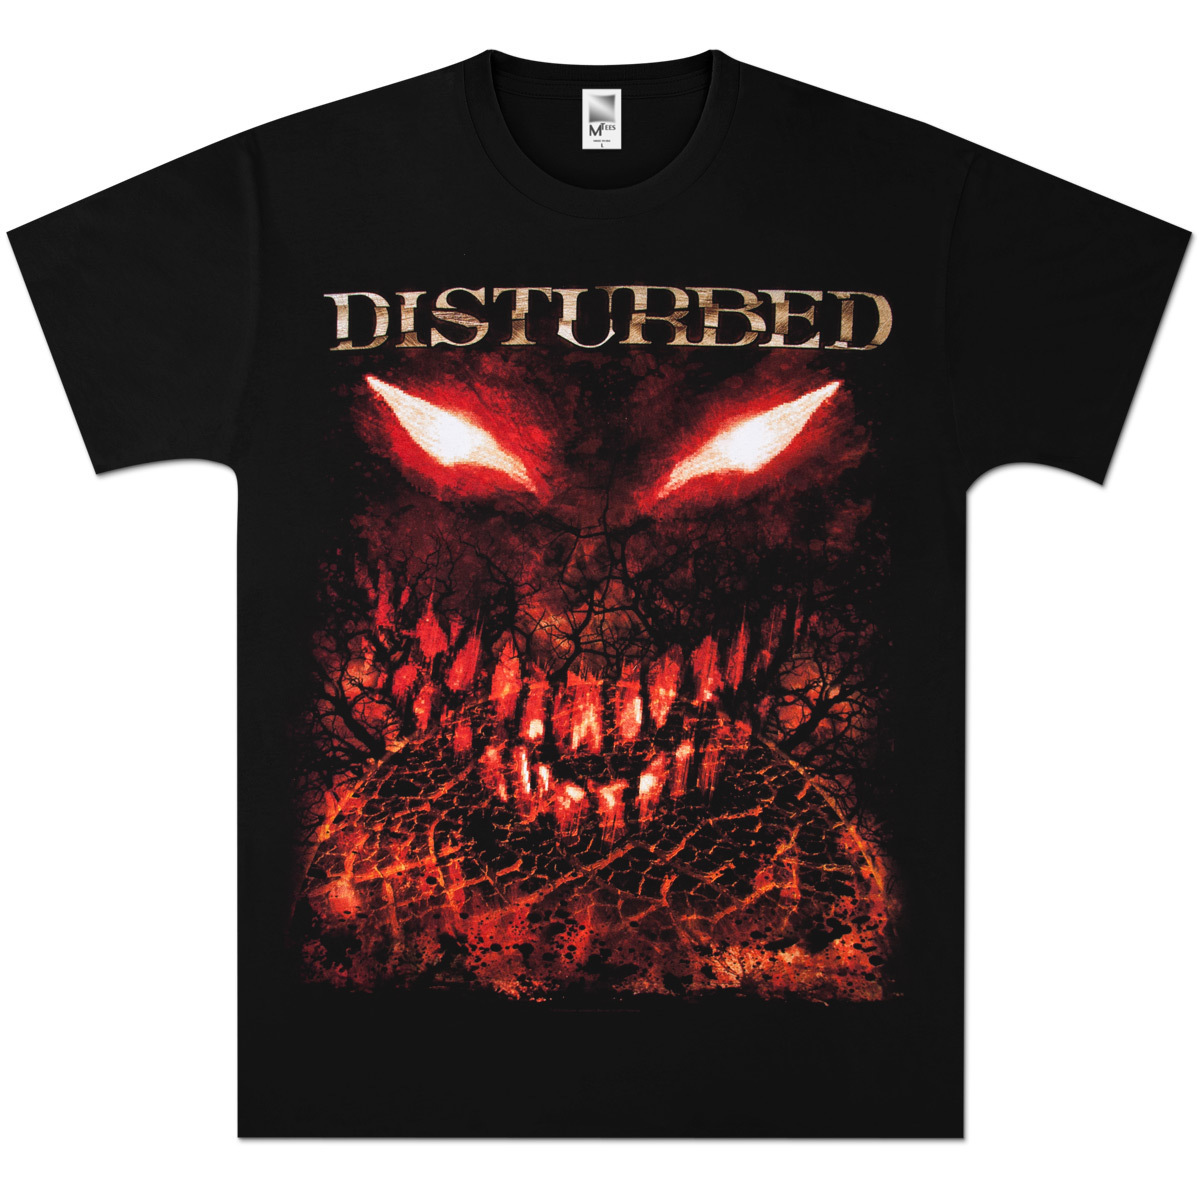 Disturbed Erosion T-Shirt